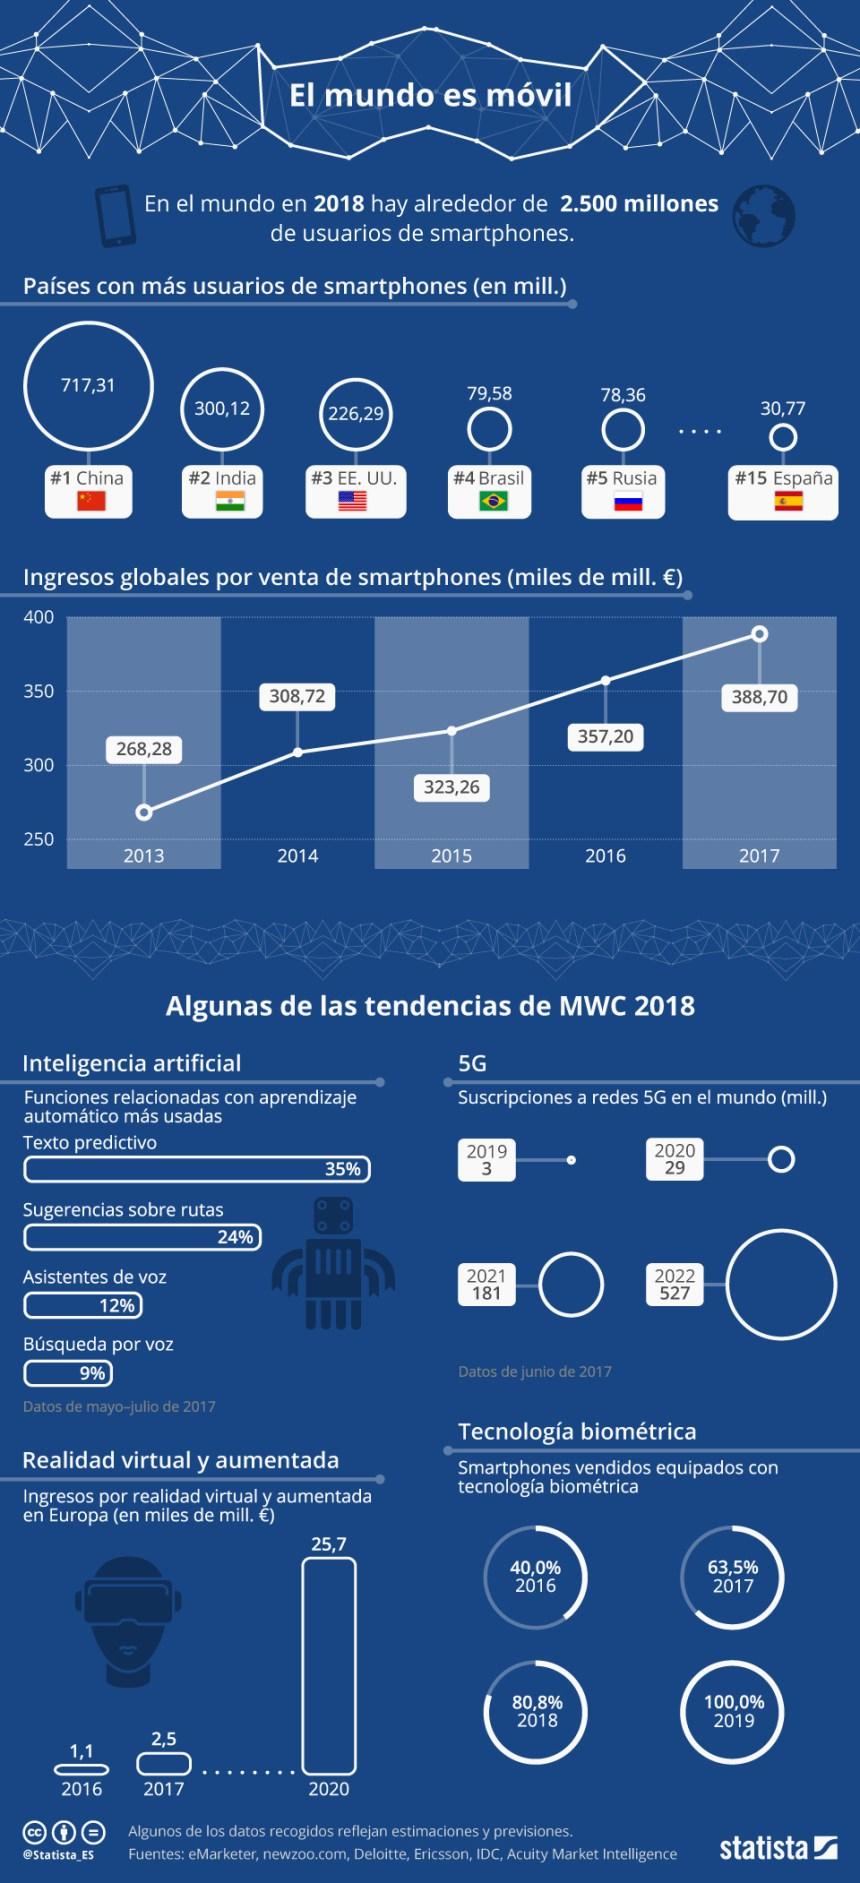 El mundo es móvil #infografia #infographic